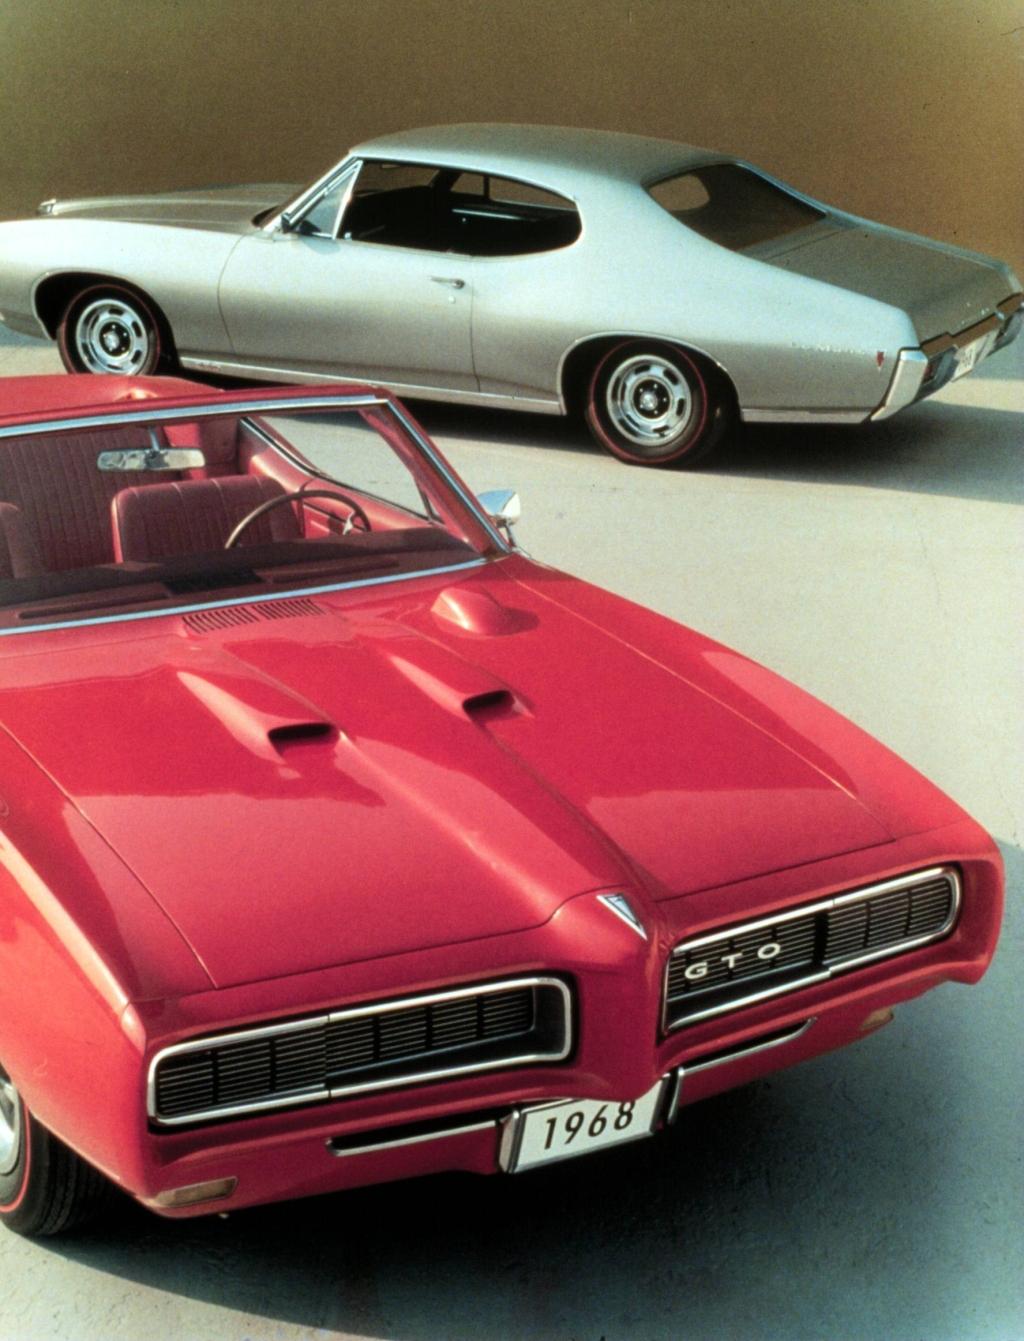 Muscle Cars History: The Pontiac GTO - autoevolution